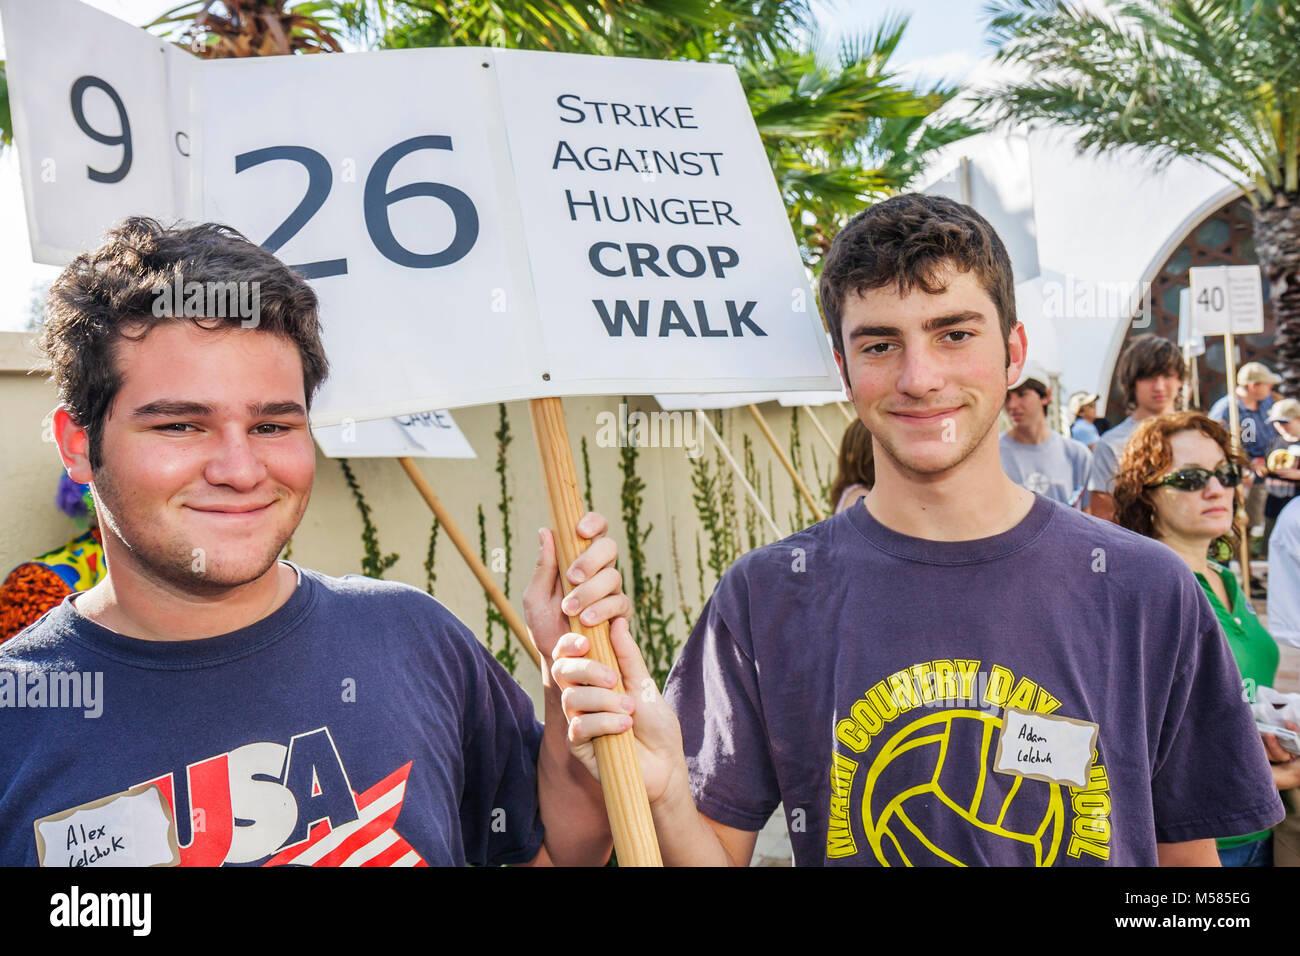 Freiwillige Helfer jungen Teenager Studenten Gruppenleiter Zeichen teilnehmen Streik gegen Hunger Ernte Spaziergang Stockbild